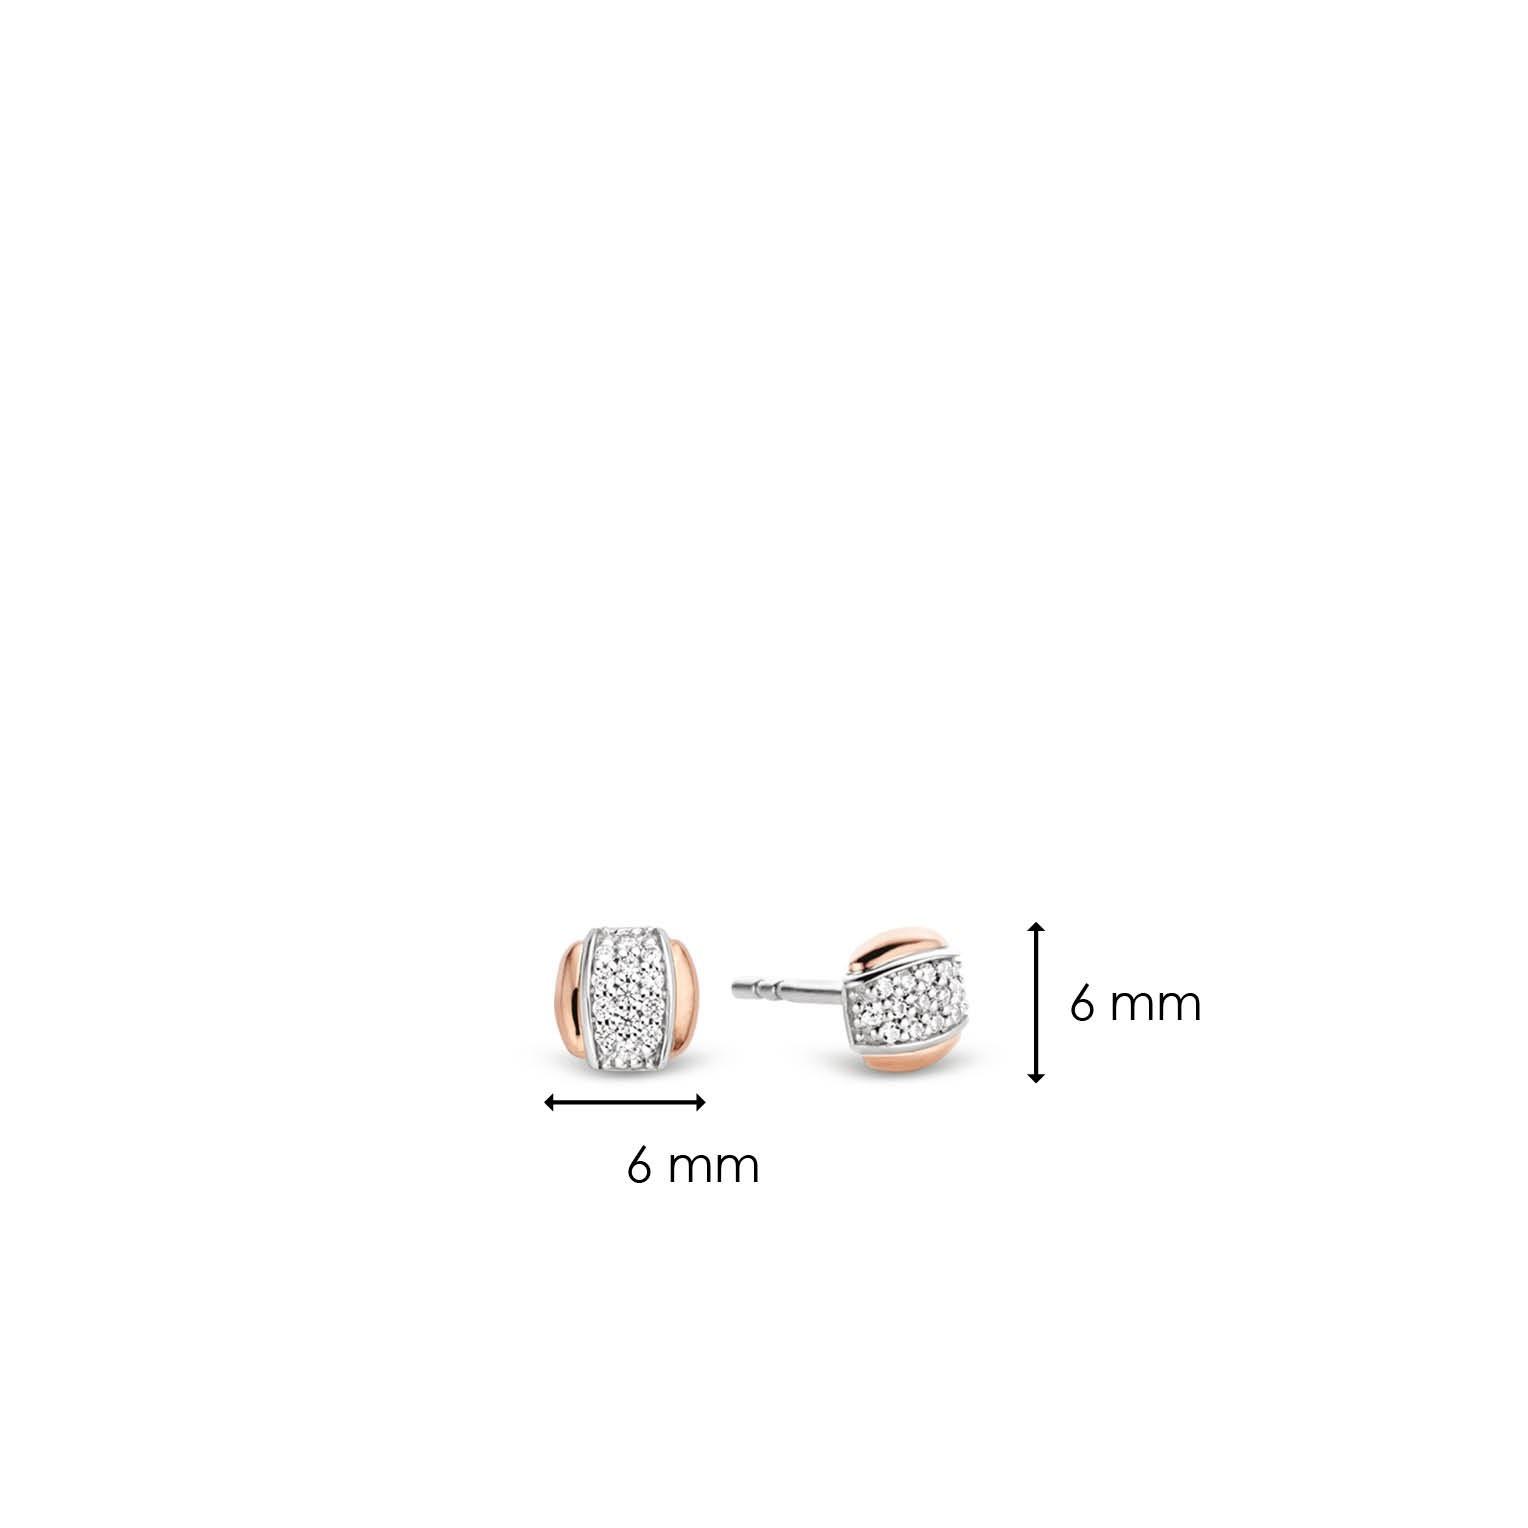 TI SENTO - Milano Earrings 7799ZR-5